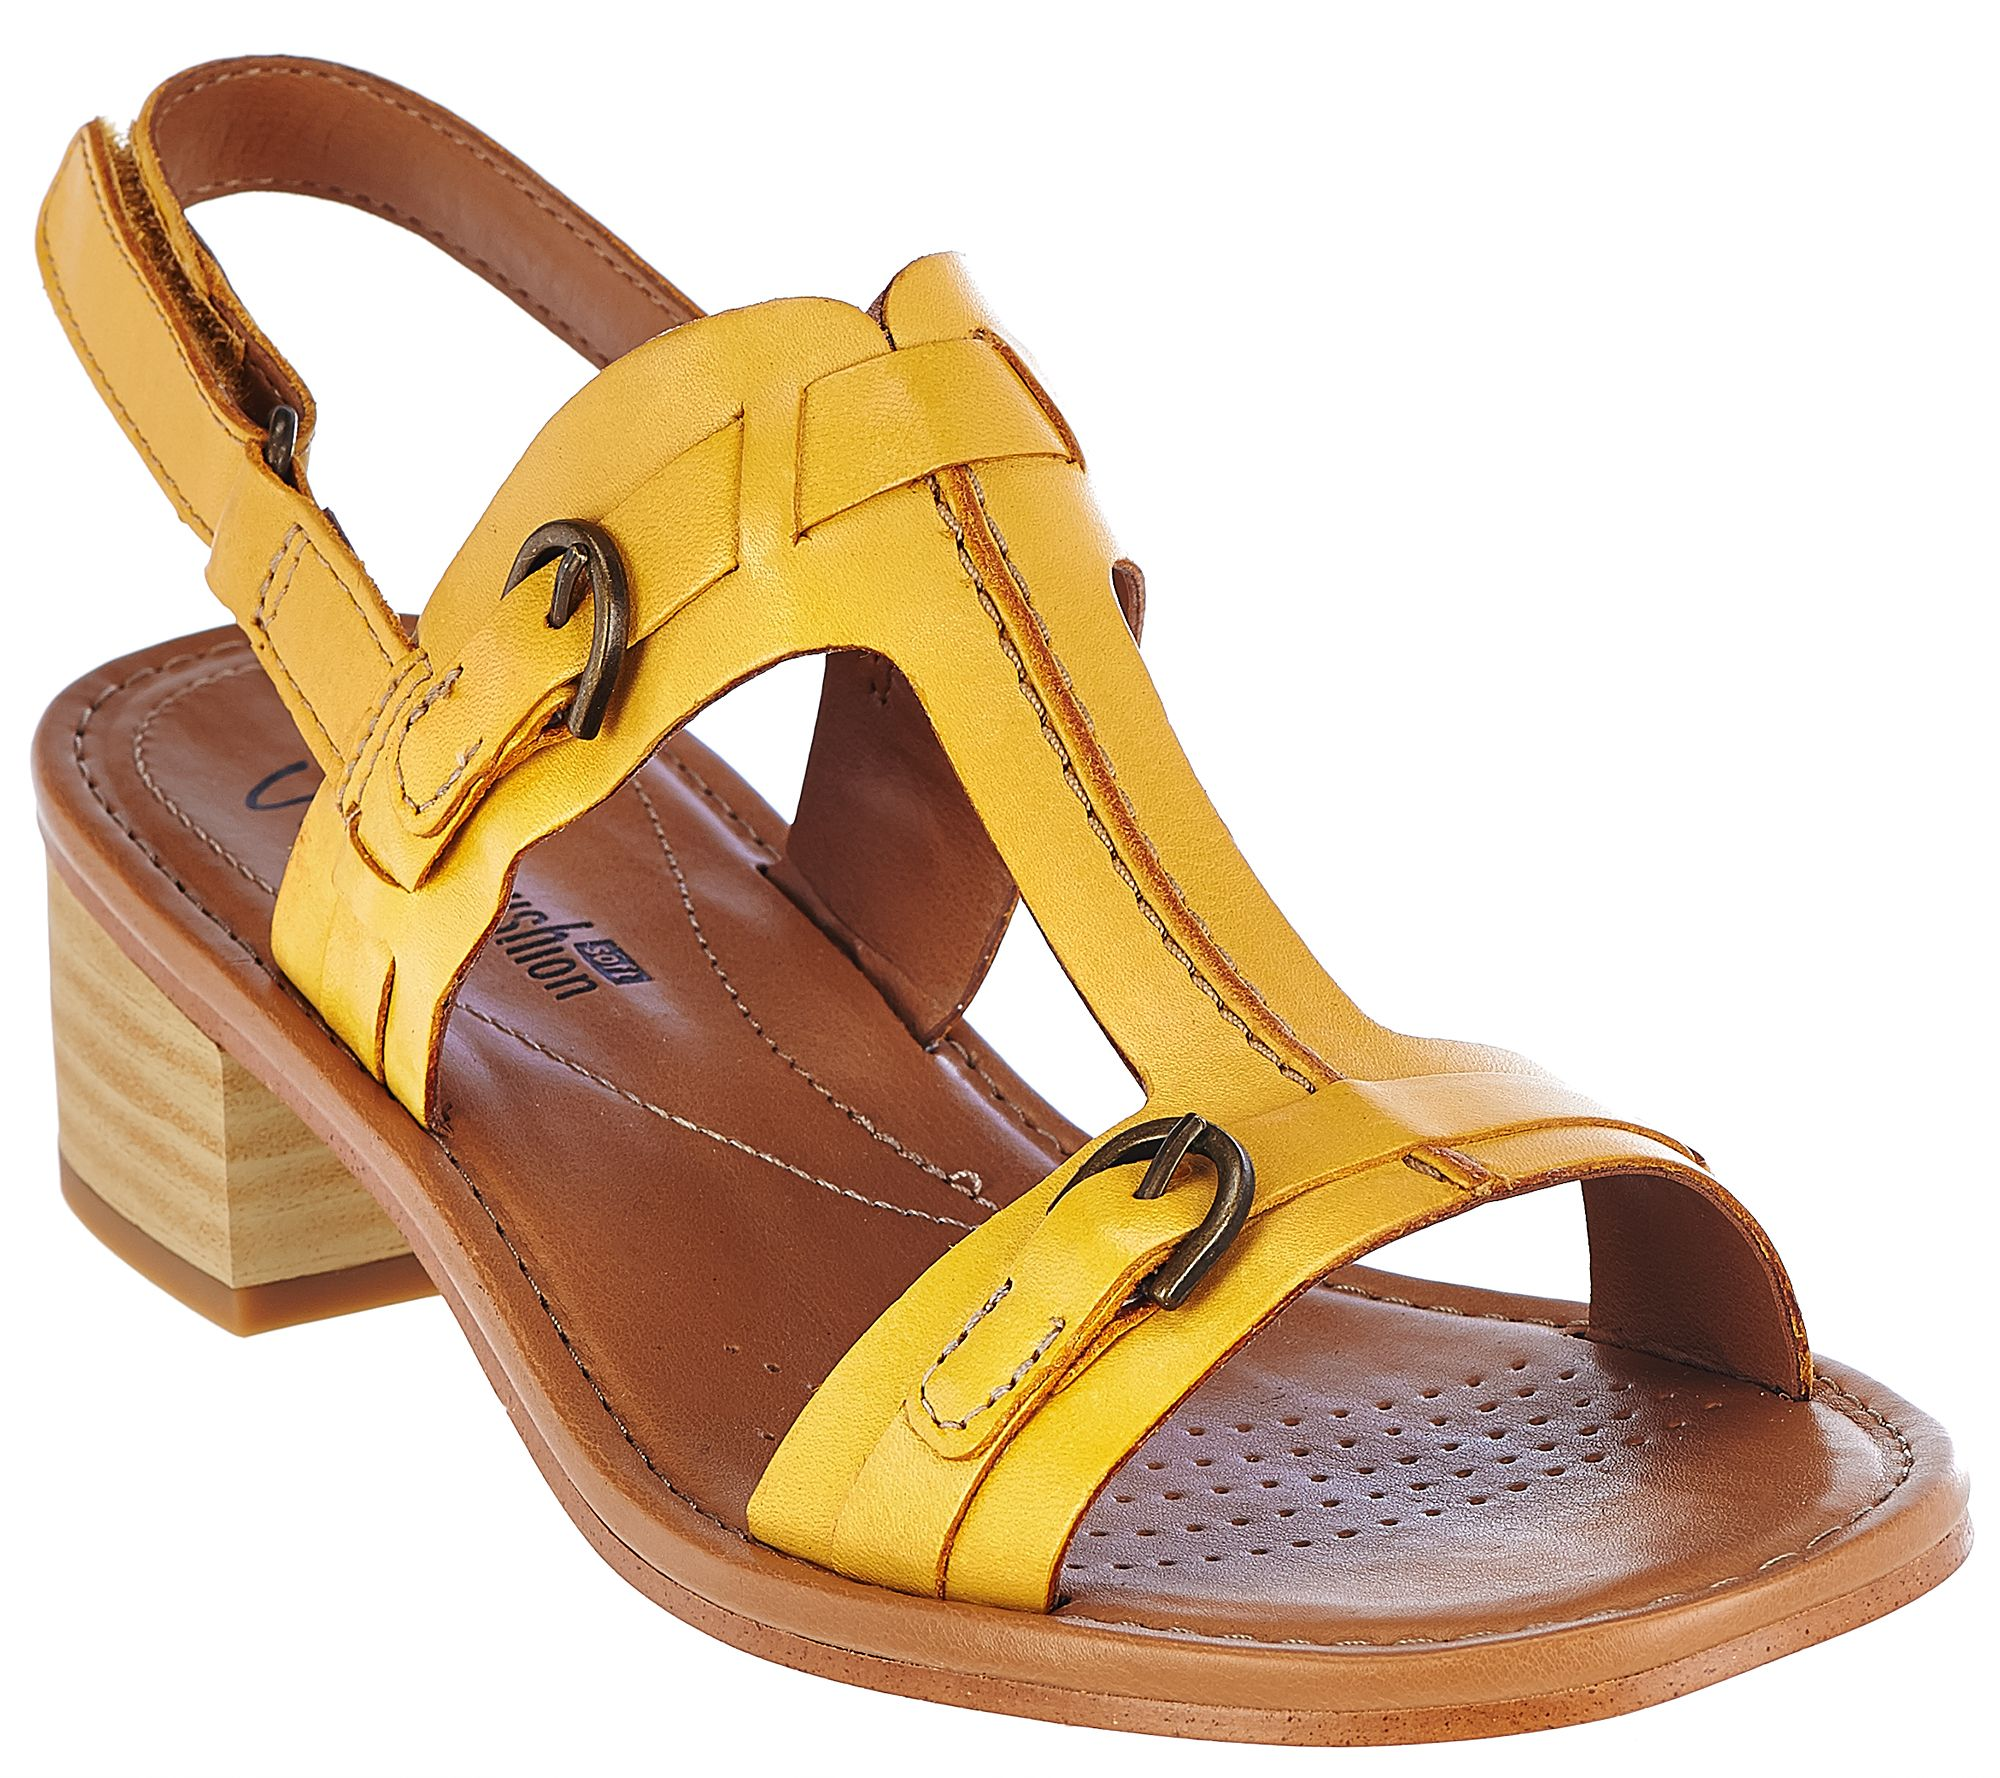 Clarks Leather Block Heel T-Strap Adj. Sandals - Reida Madalyn - Page 1 —  QVC.com